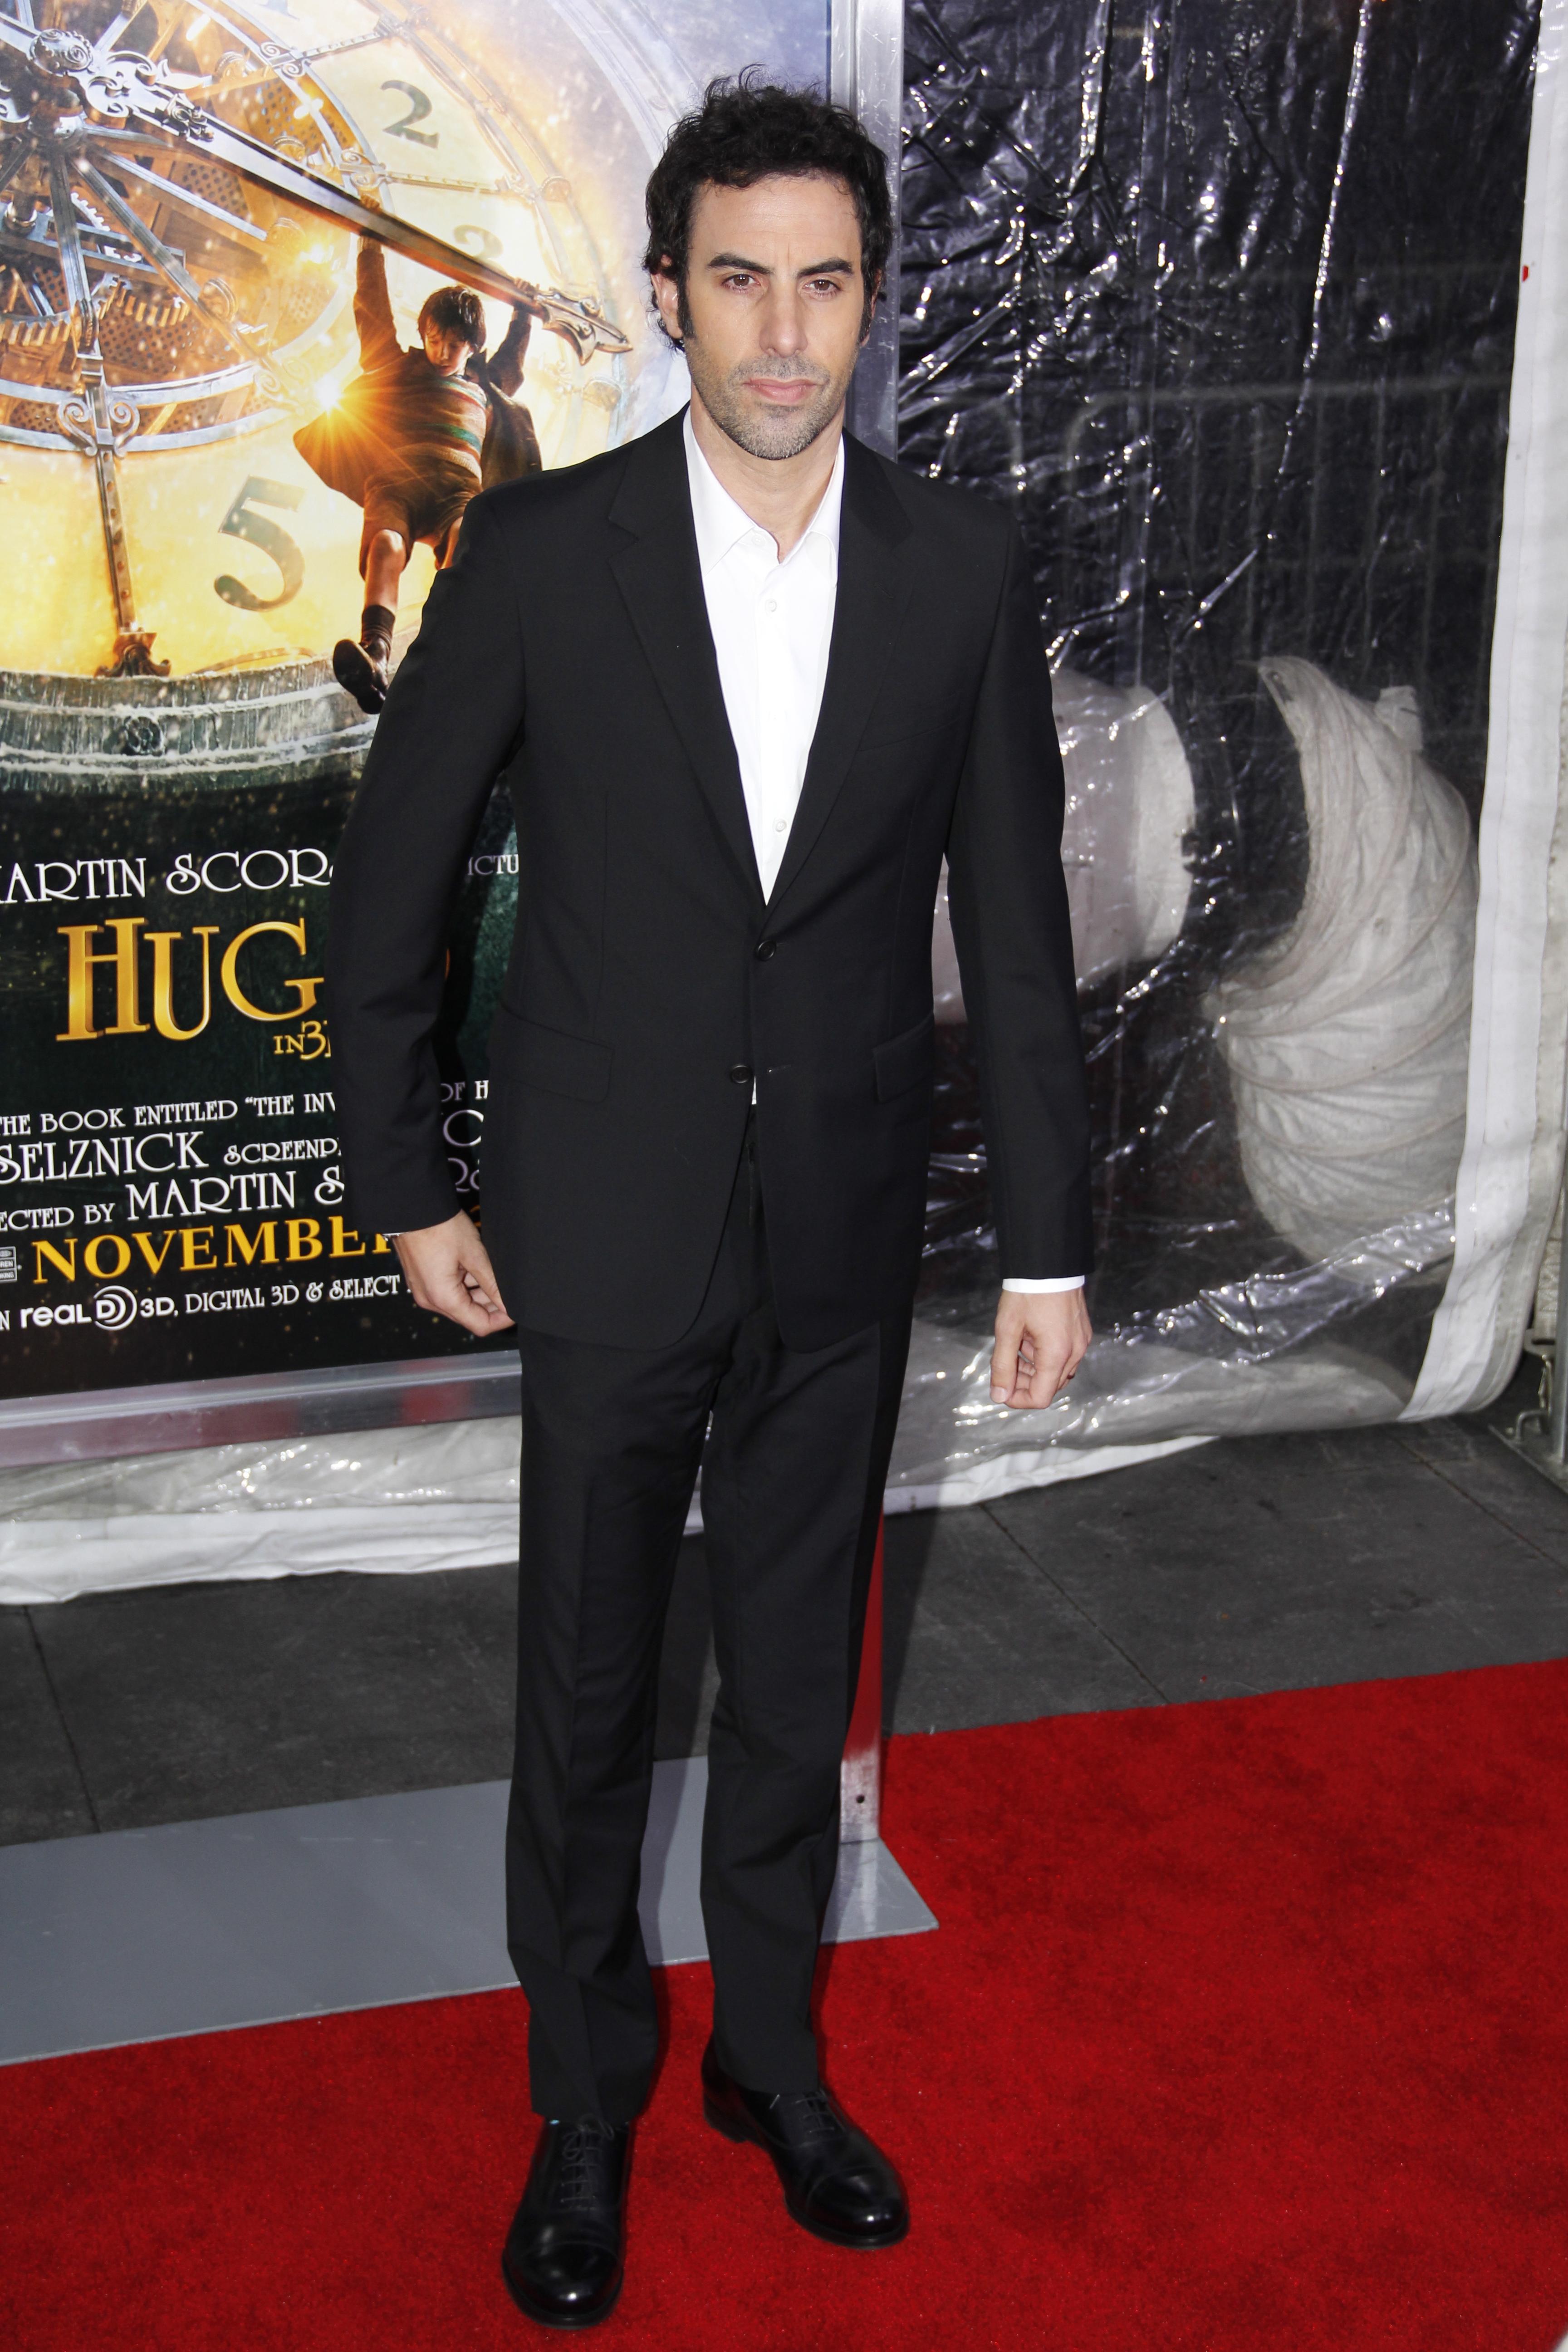 Sacha Baron Cohen at the Hugo Premiere, Ziegfield Theatre, New York City, on November 21 2011.